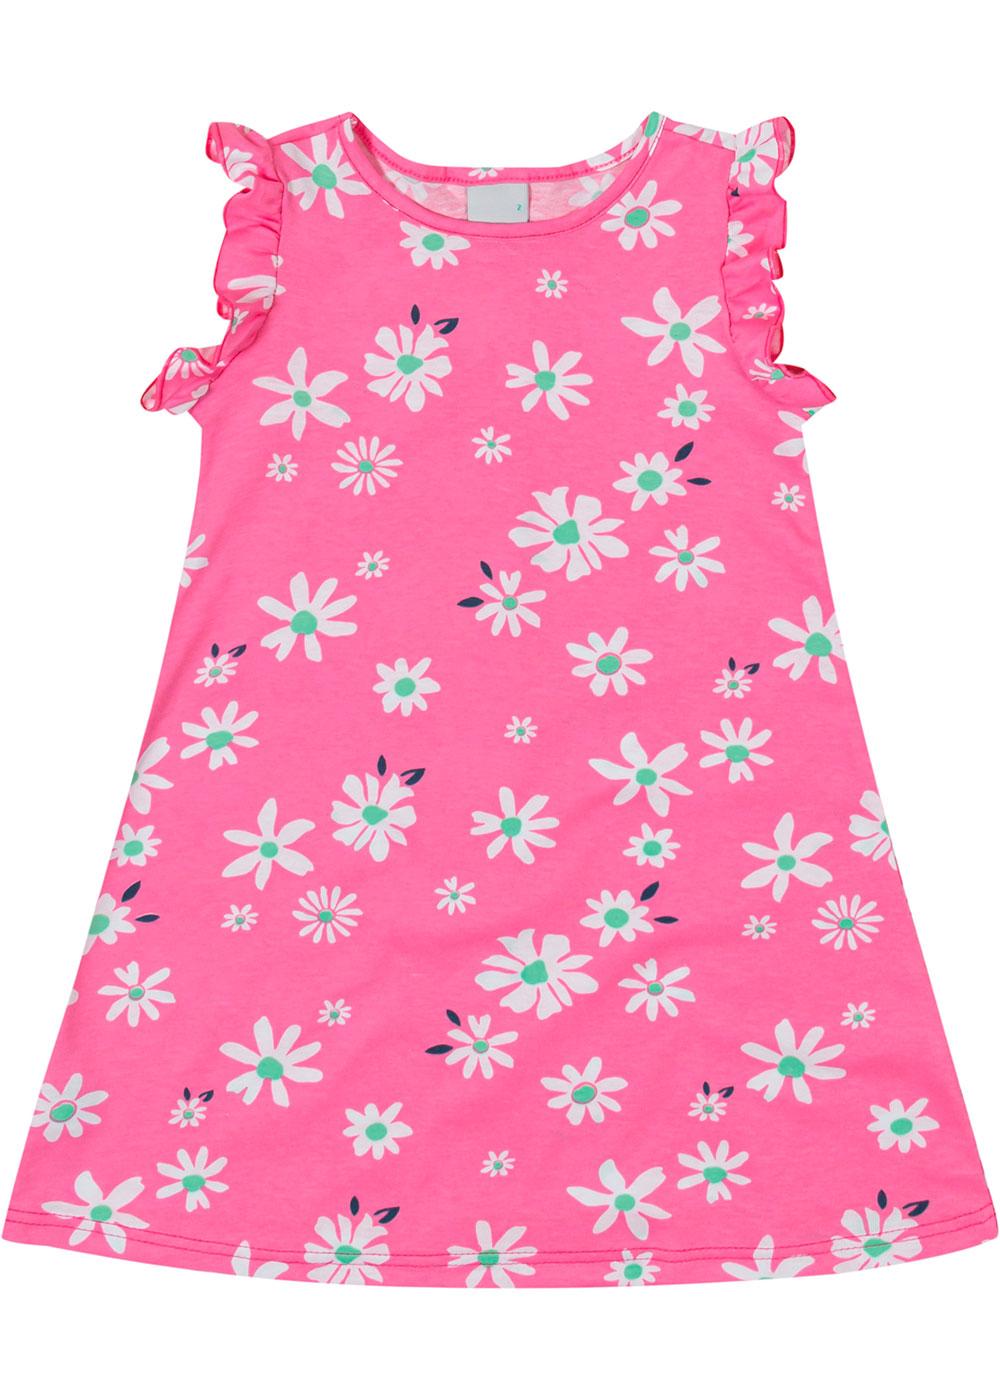 Vestido Infantil Curto Rosa Flores - Malwee